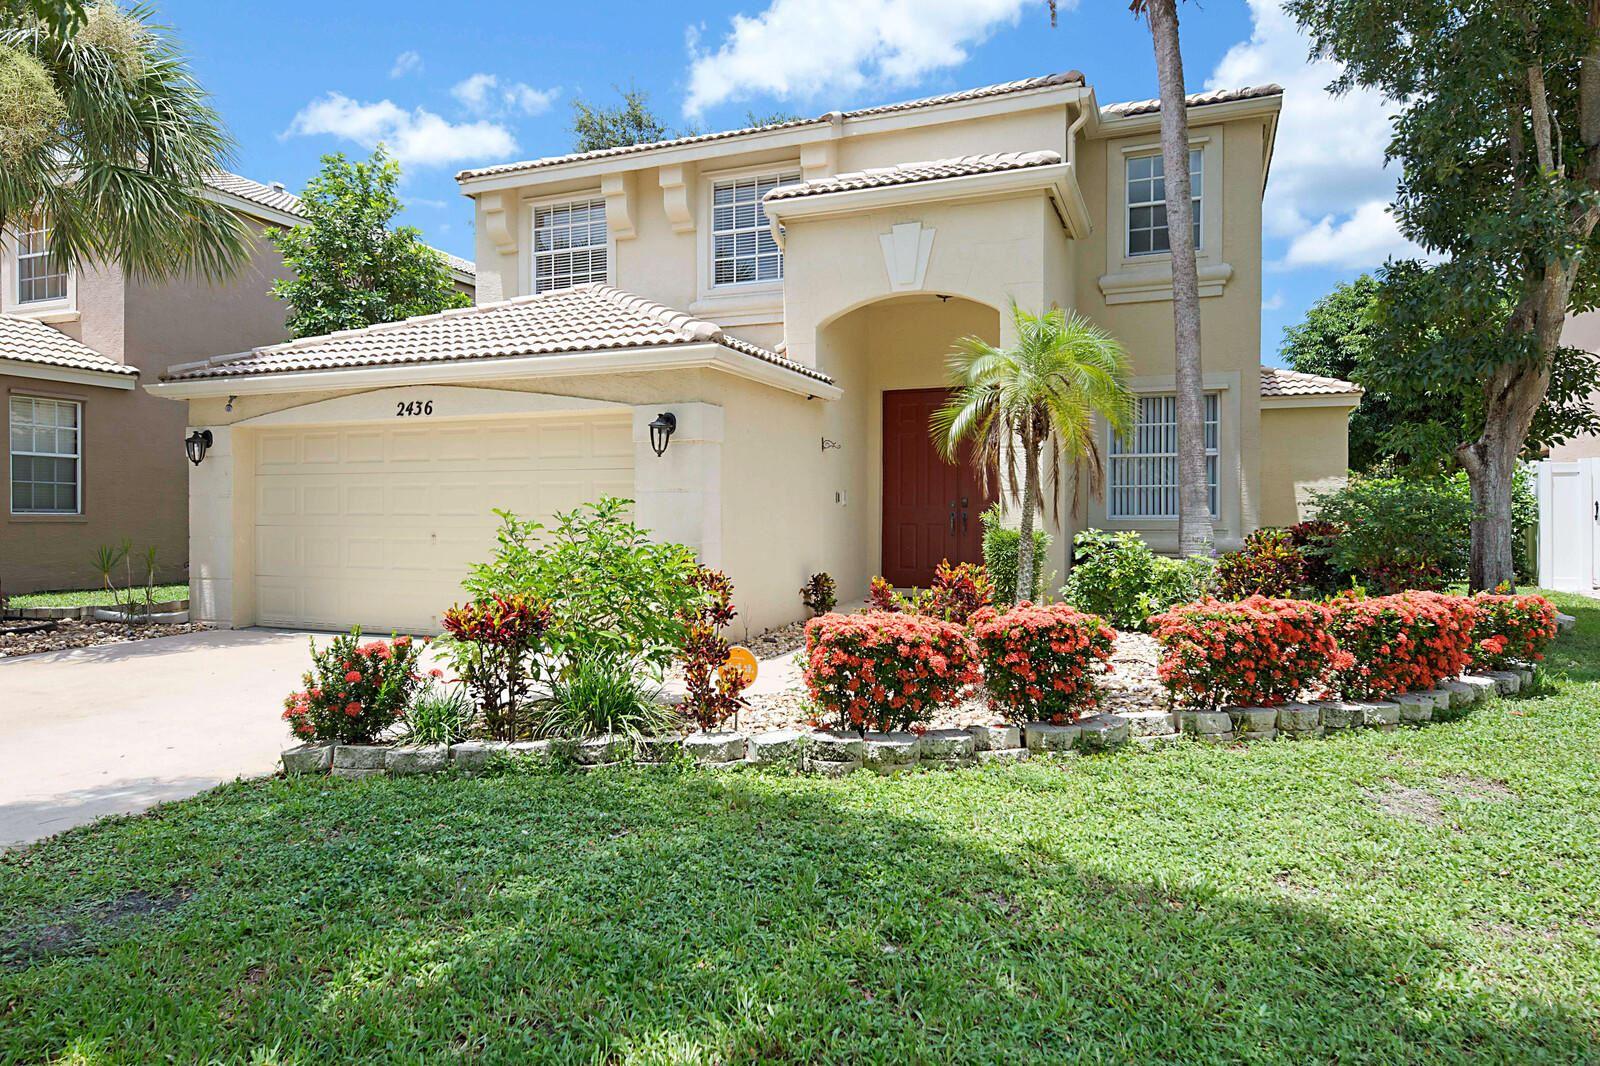 2436 Westmont Drive, Royal Palm Beach, FL 33411 - #: RX-10735366